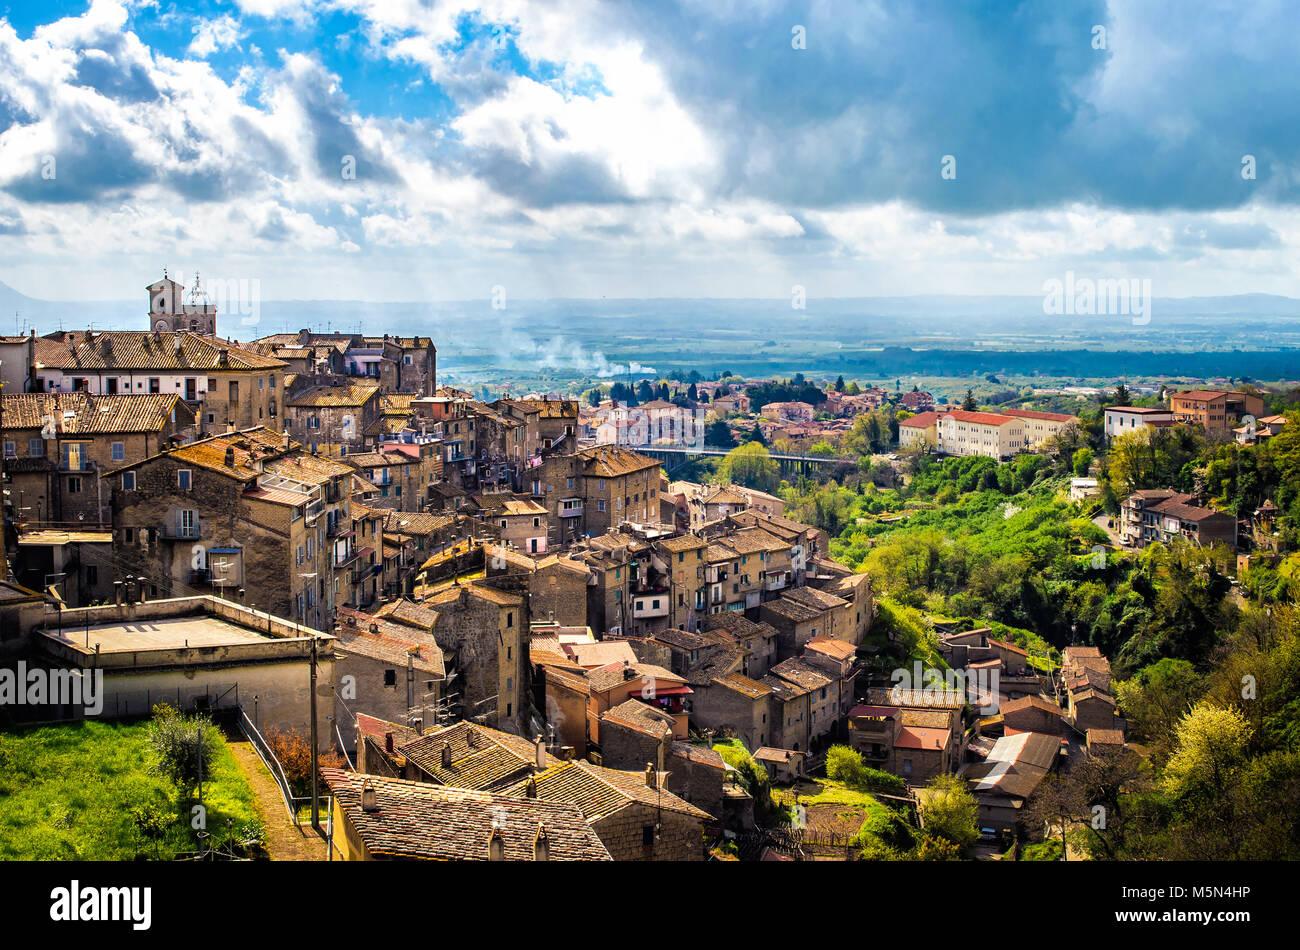 Caprarola latium Village Panorama - Landschaften der Provinz Viterbo - Italien Stockbild